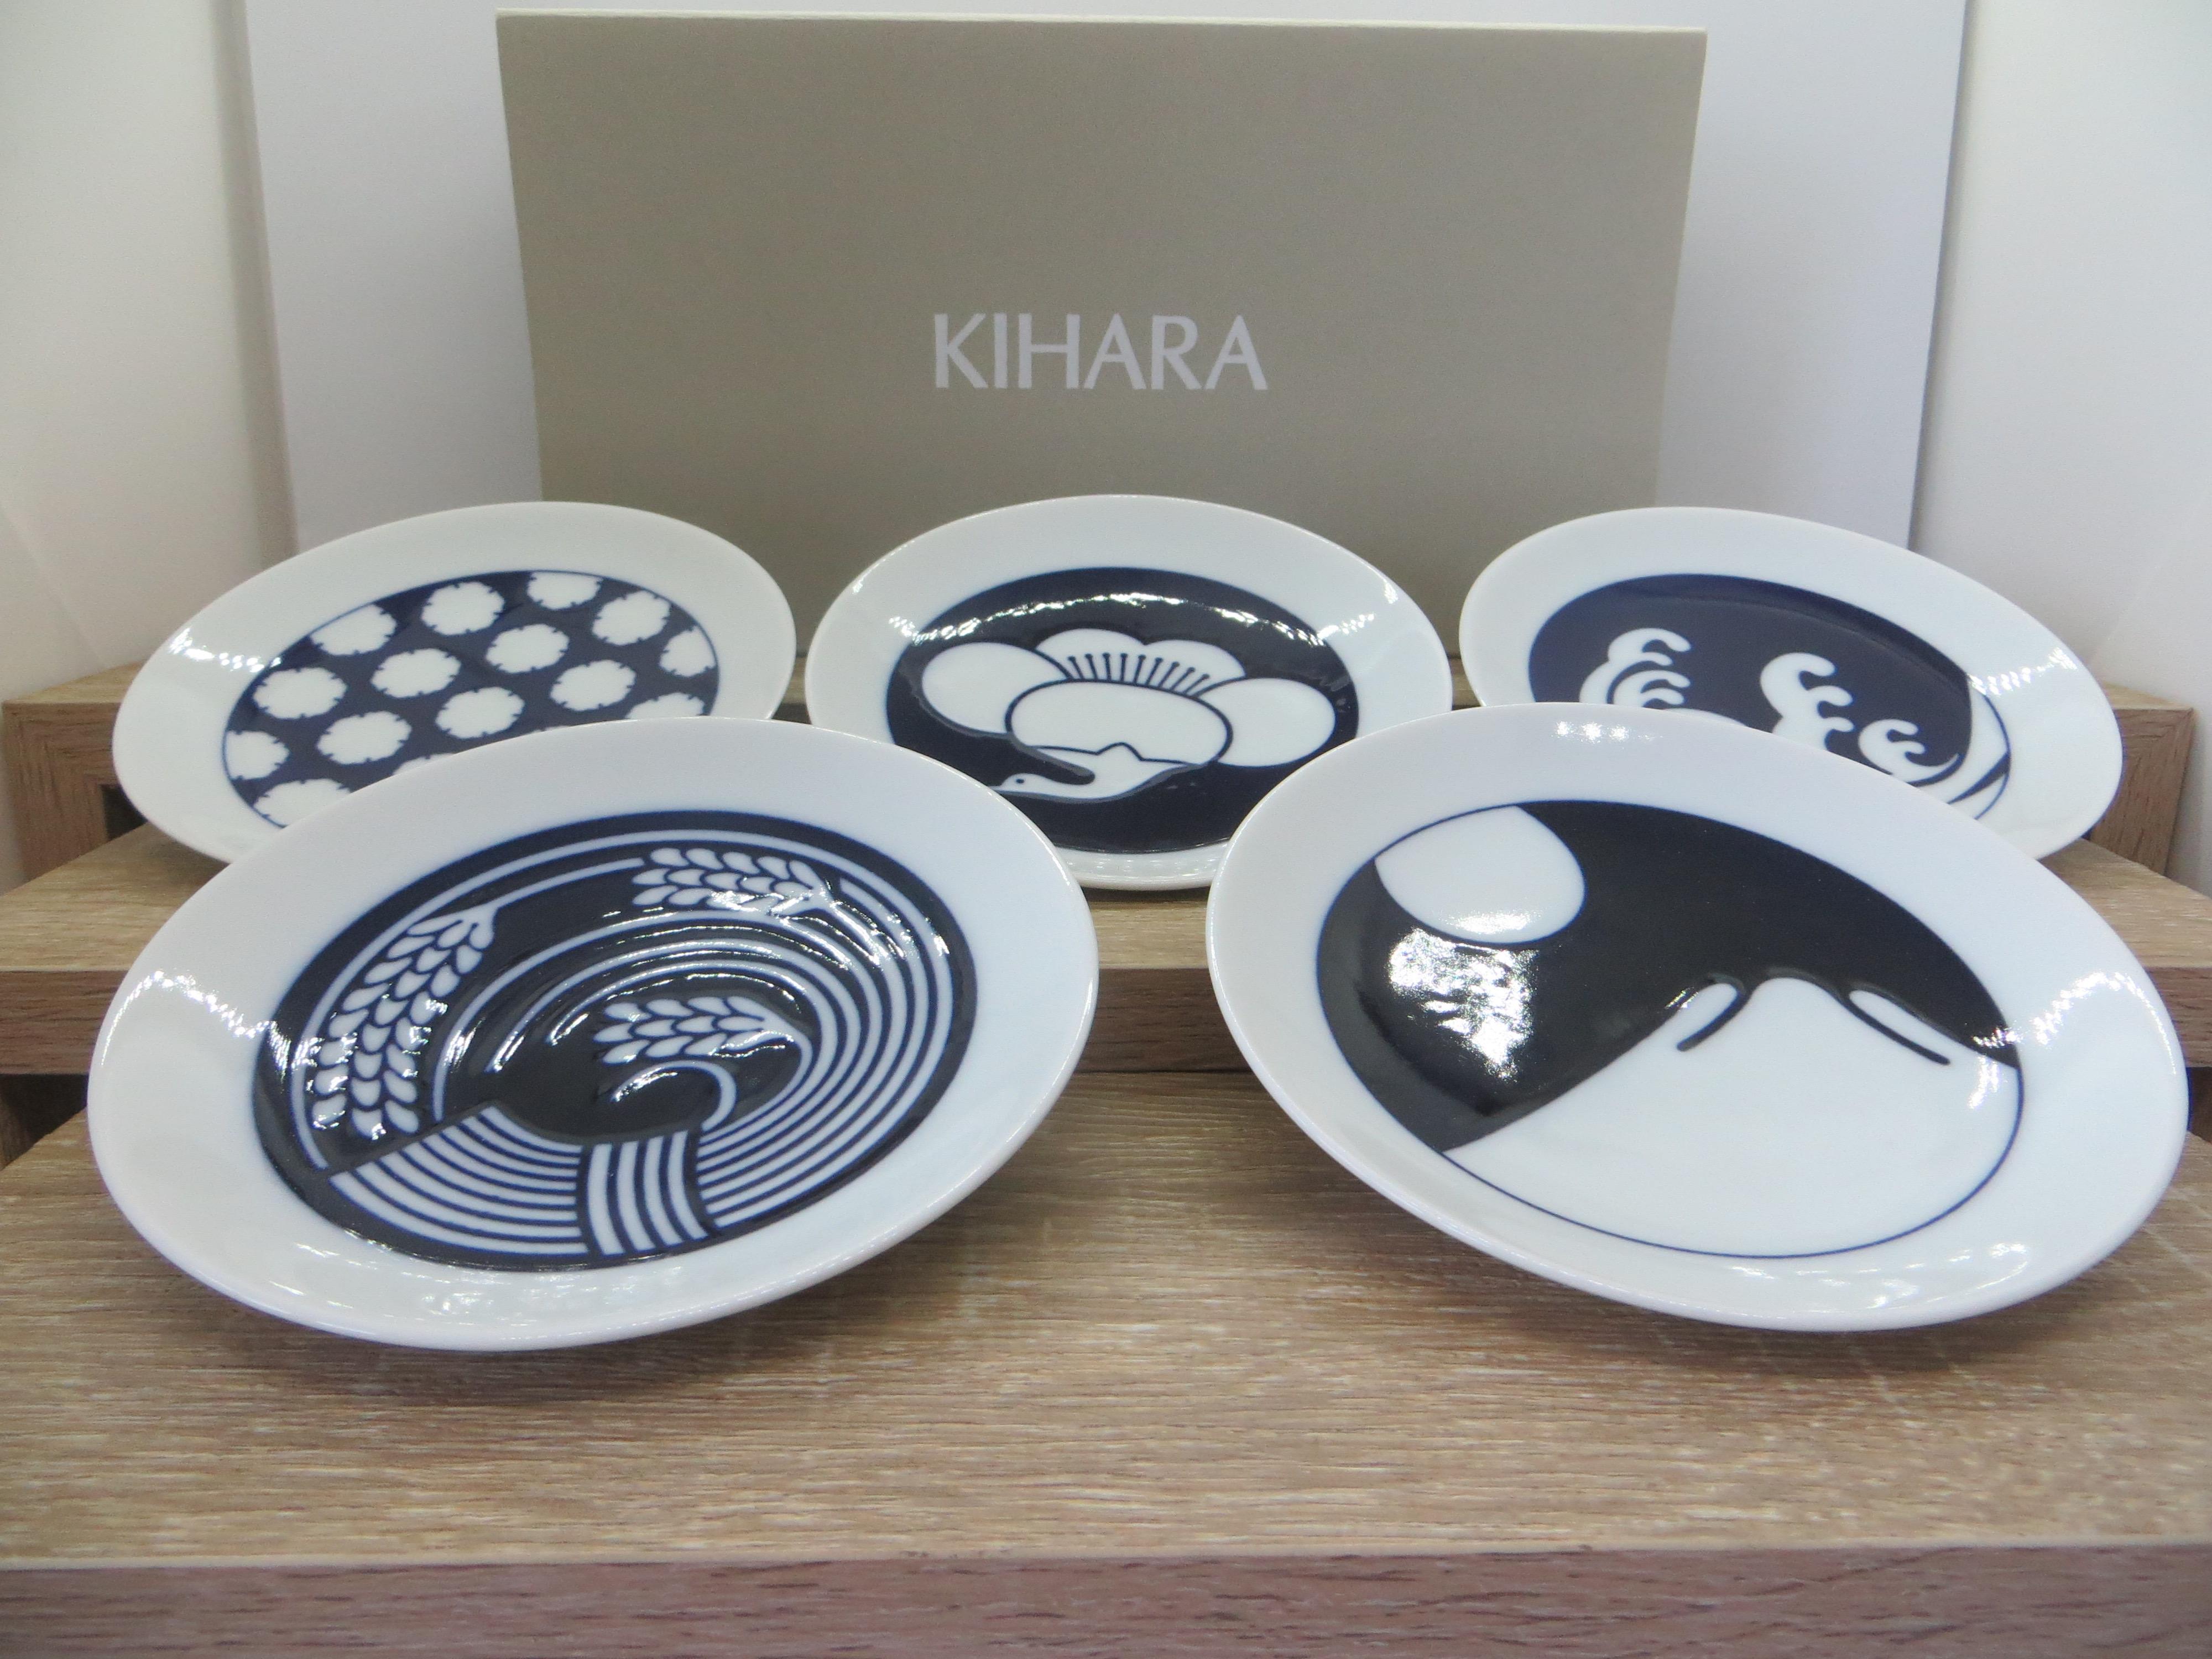 KIHARA Komon Mame Dish Set (5 pieces)